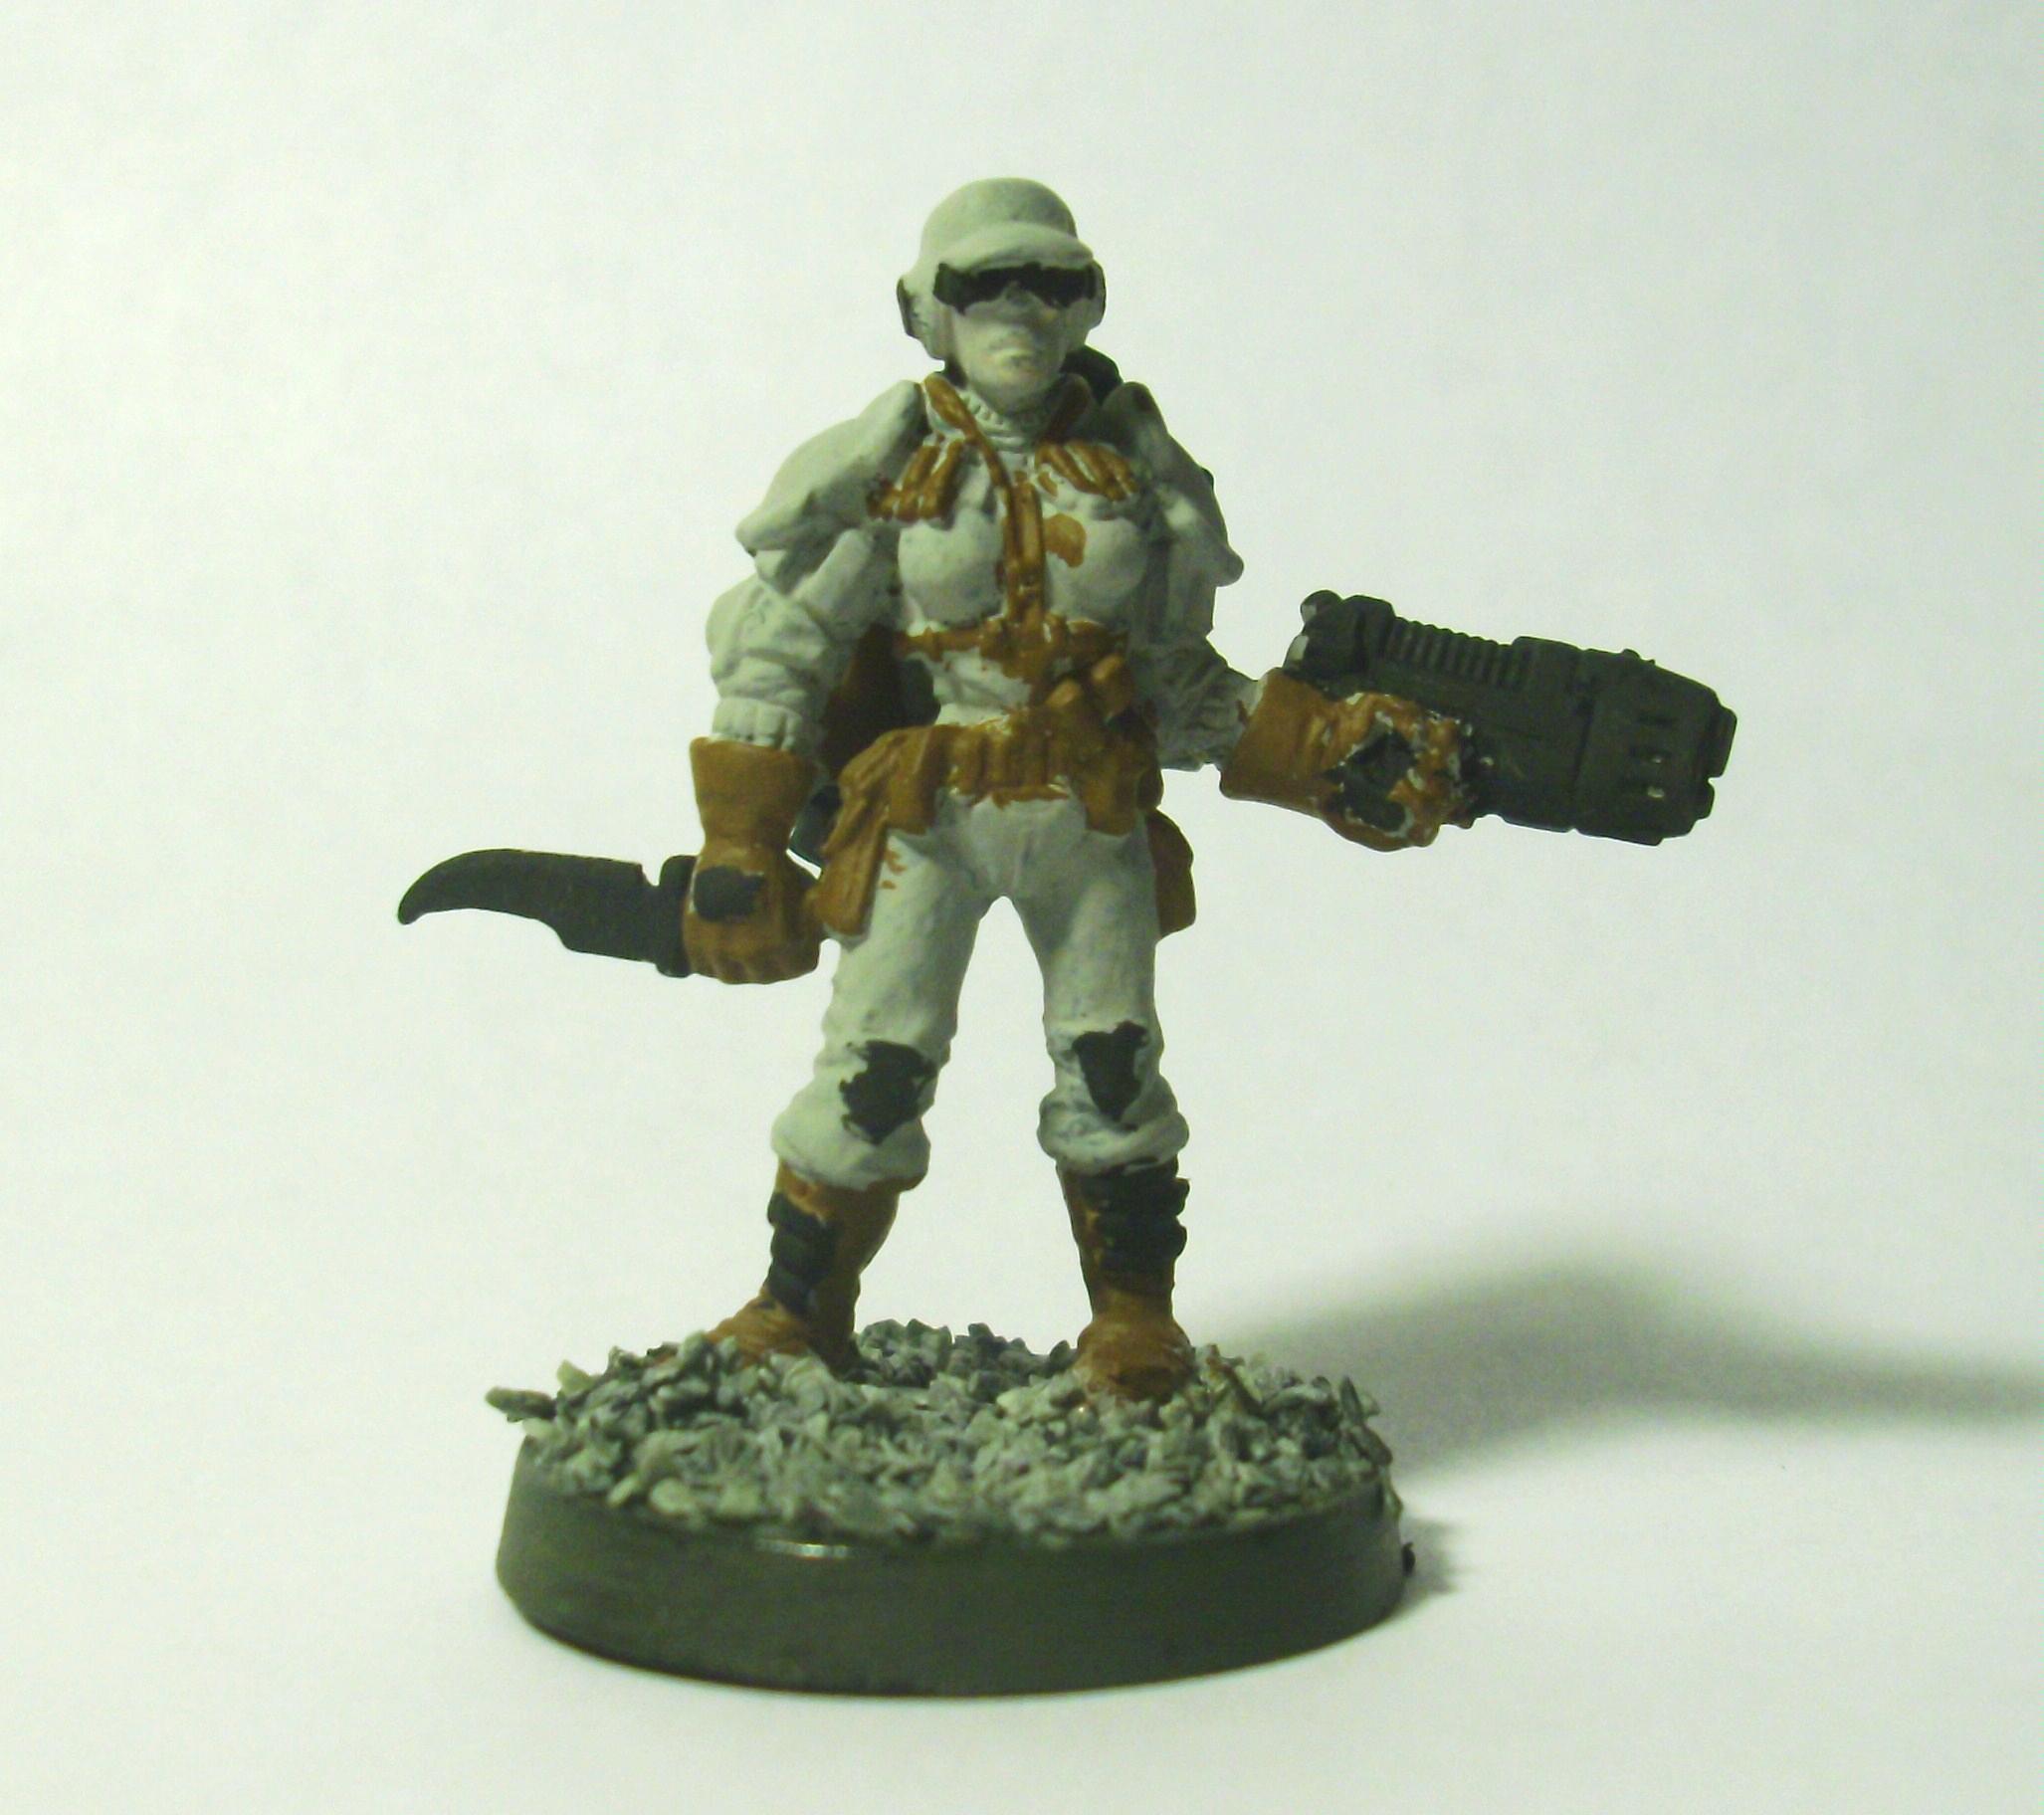 Henchman, Inquisitor